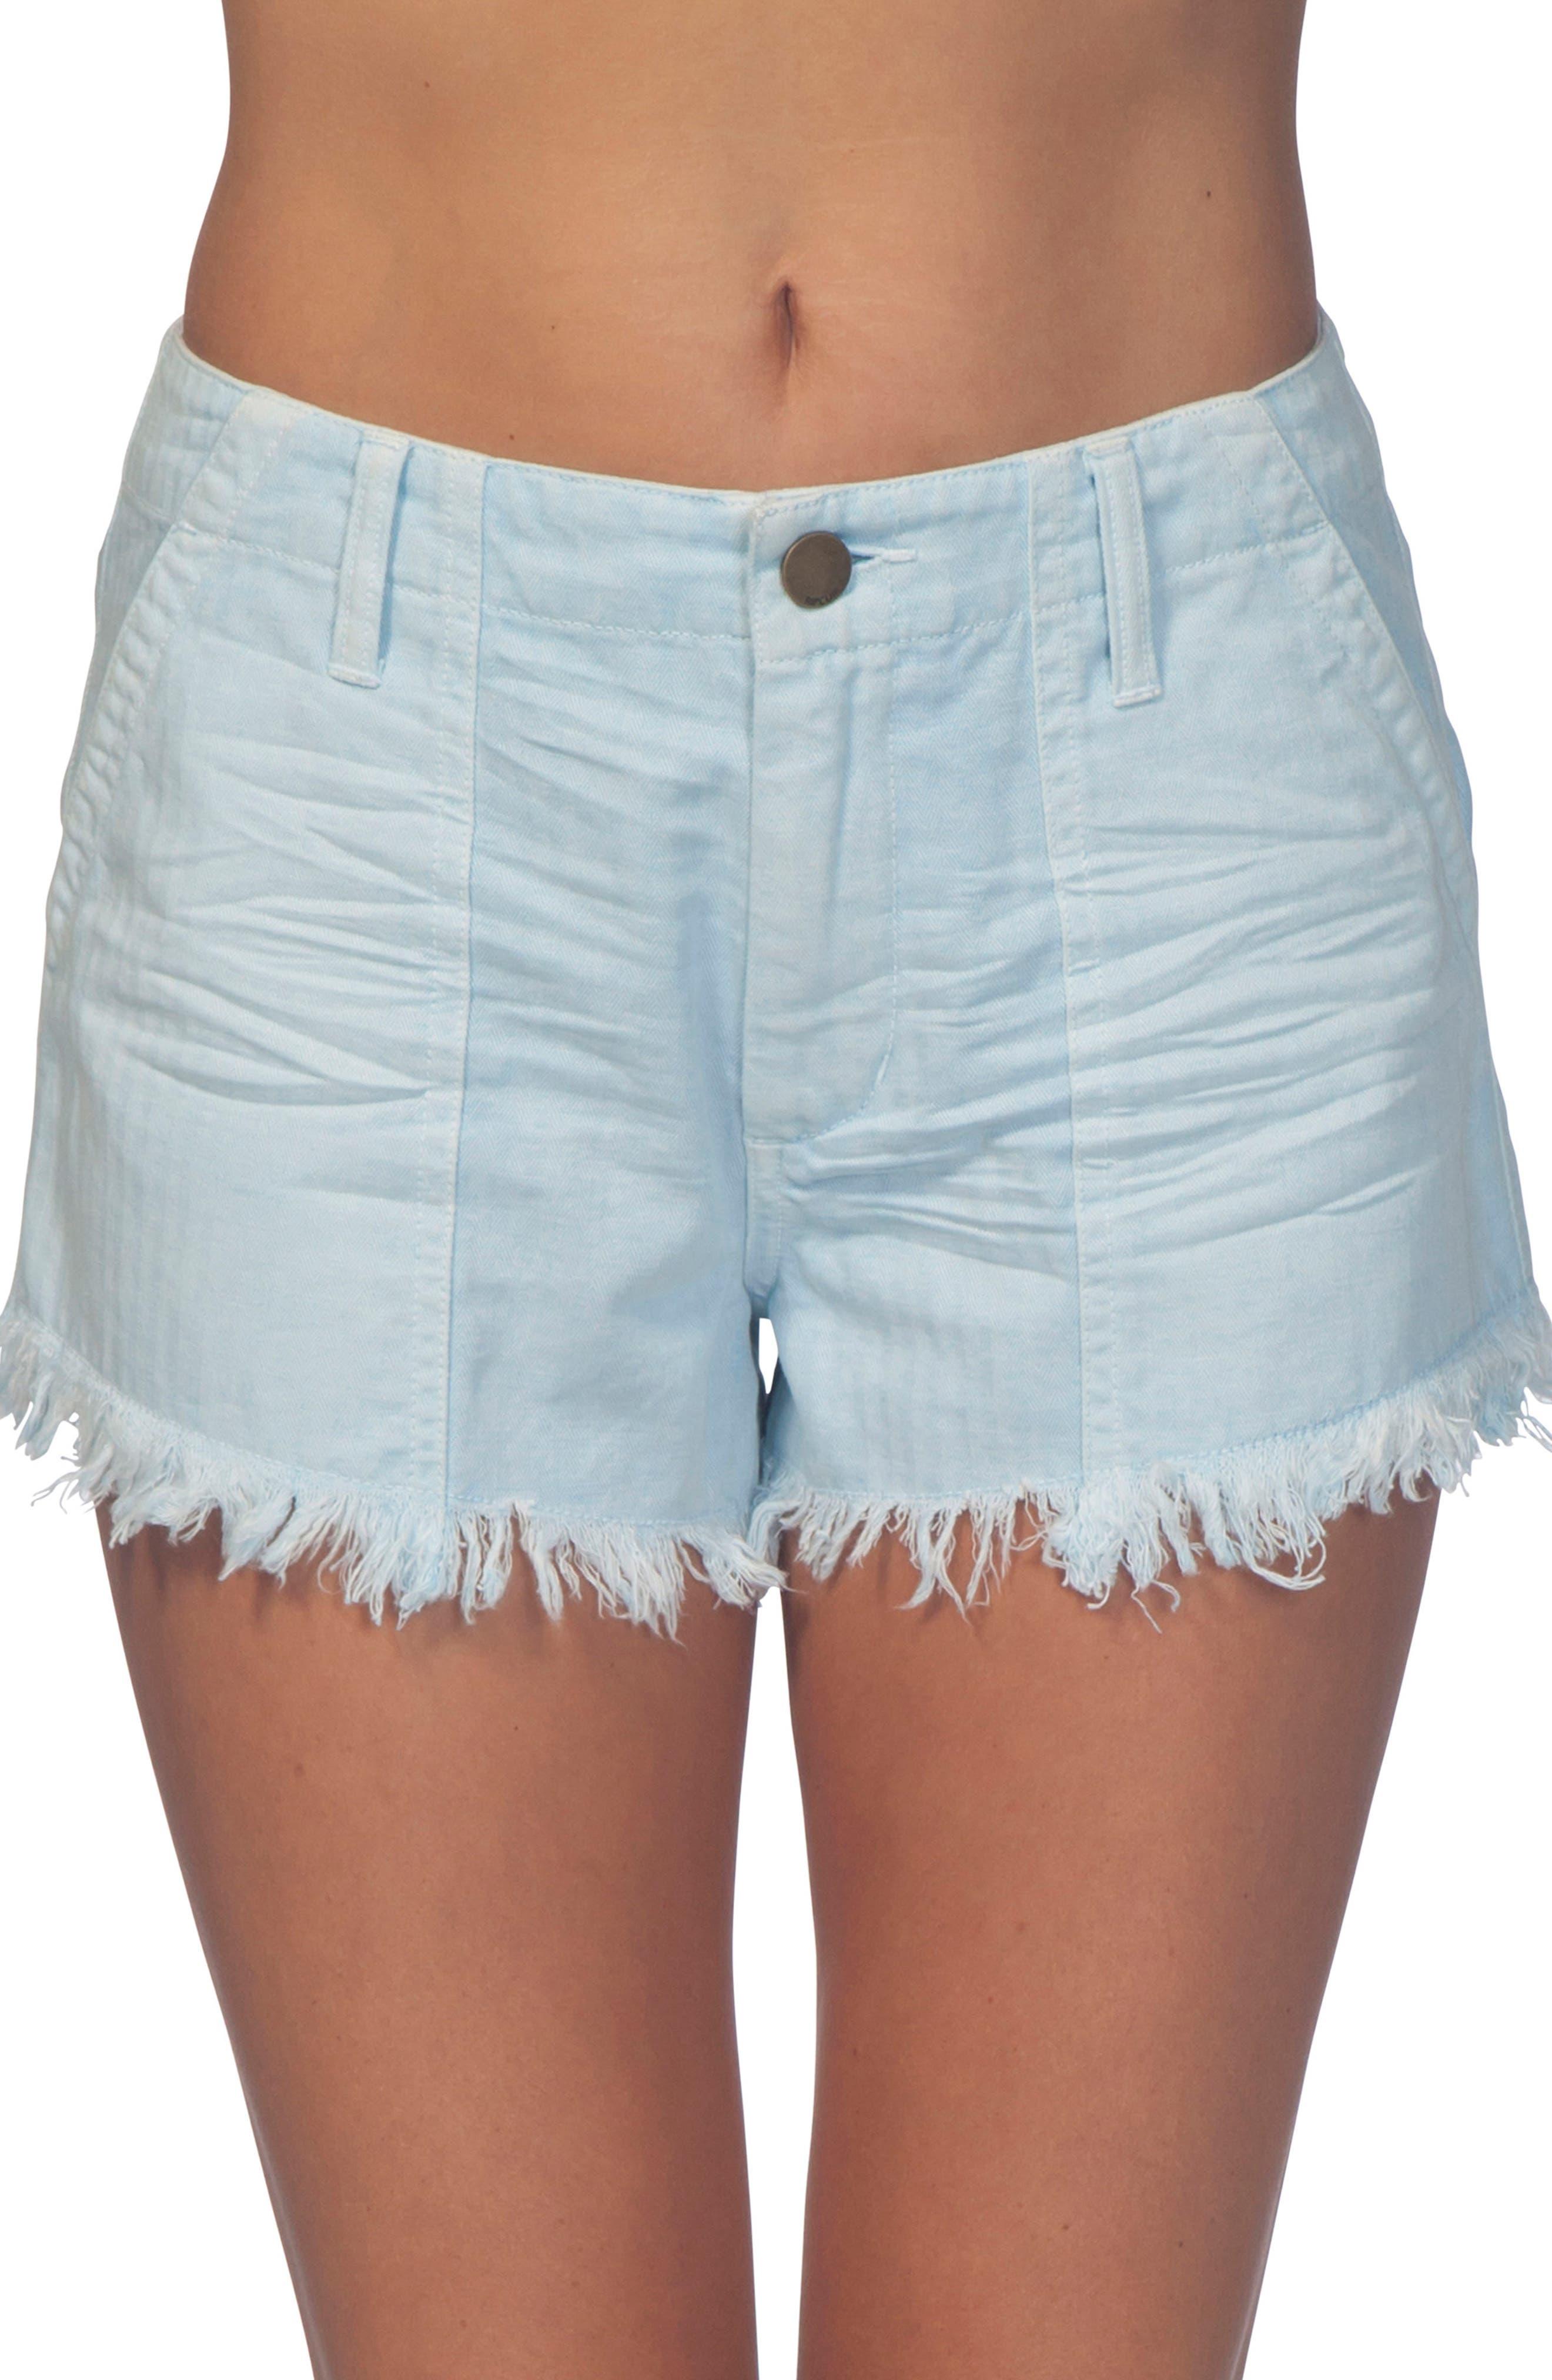 Vista Cutoff Denim Shorts,                             Main thumbnail 1, color,                             453